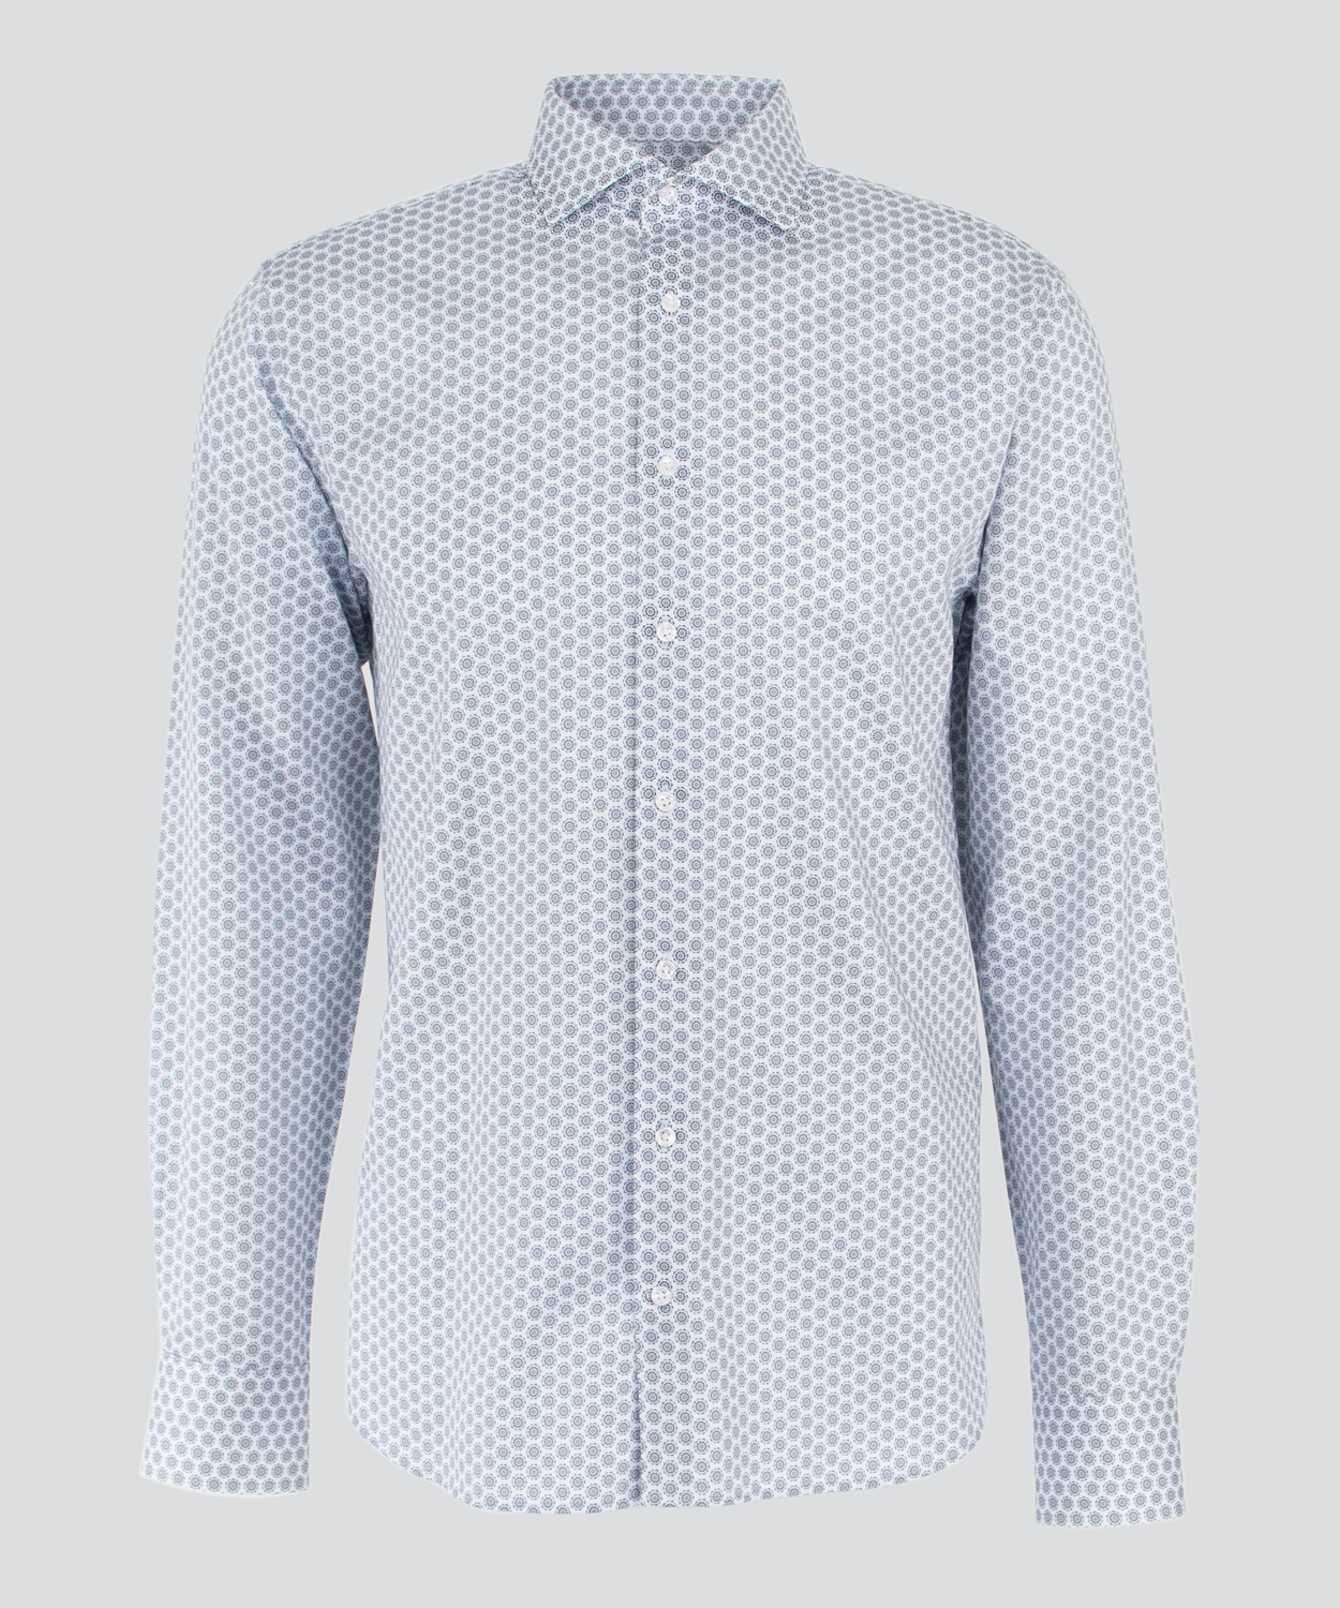 Shirt Gavardo White The Shirt Factory